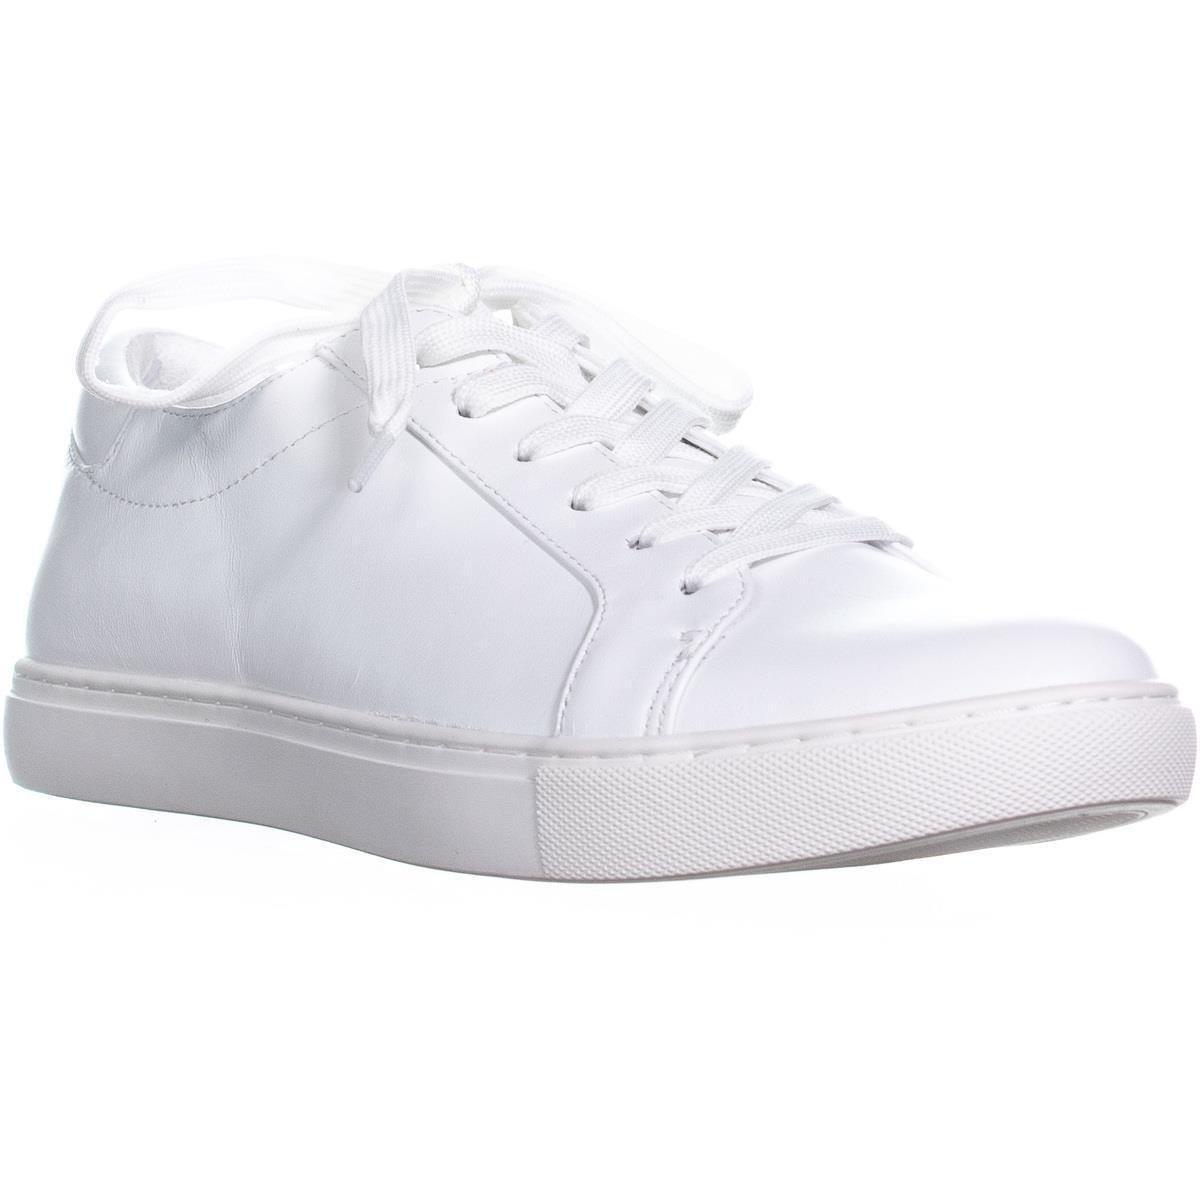 Kenneth Cole Women's Kam Pride Sneaker B071XY389H 7.5 B(M) US|White